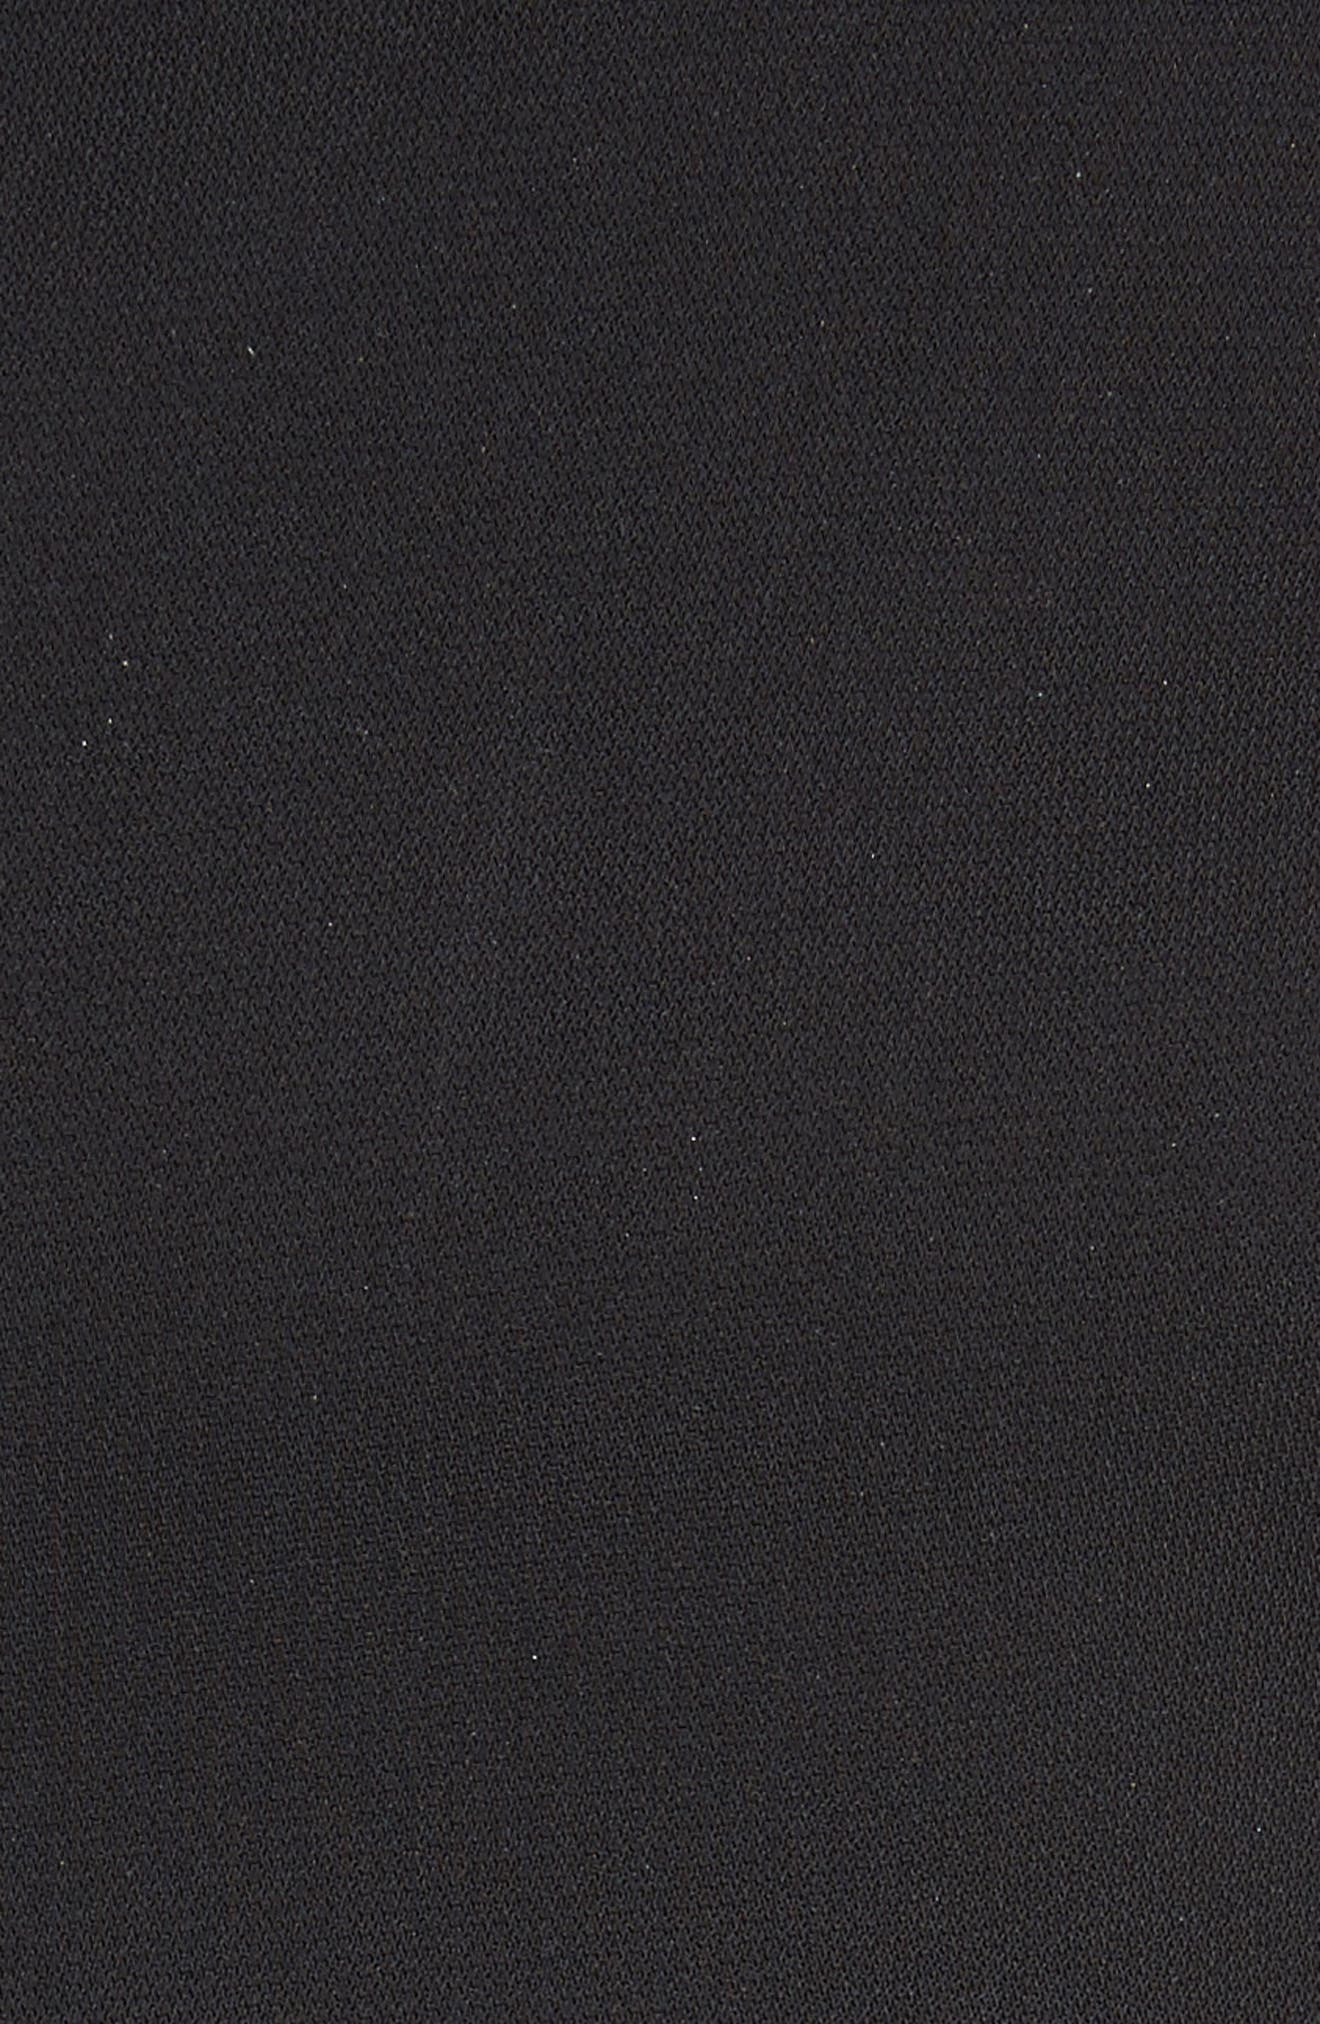 Elettra Ruffle Front Bonded Crepe Halter Dress,                             Alternate thumbnail 5, color,                             006